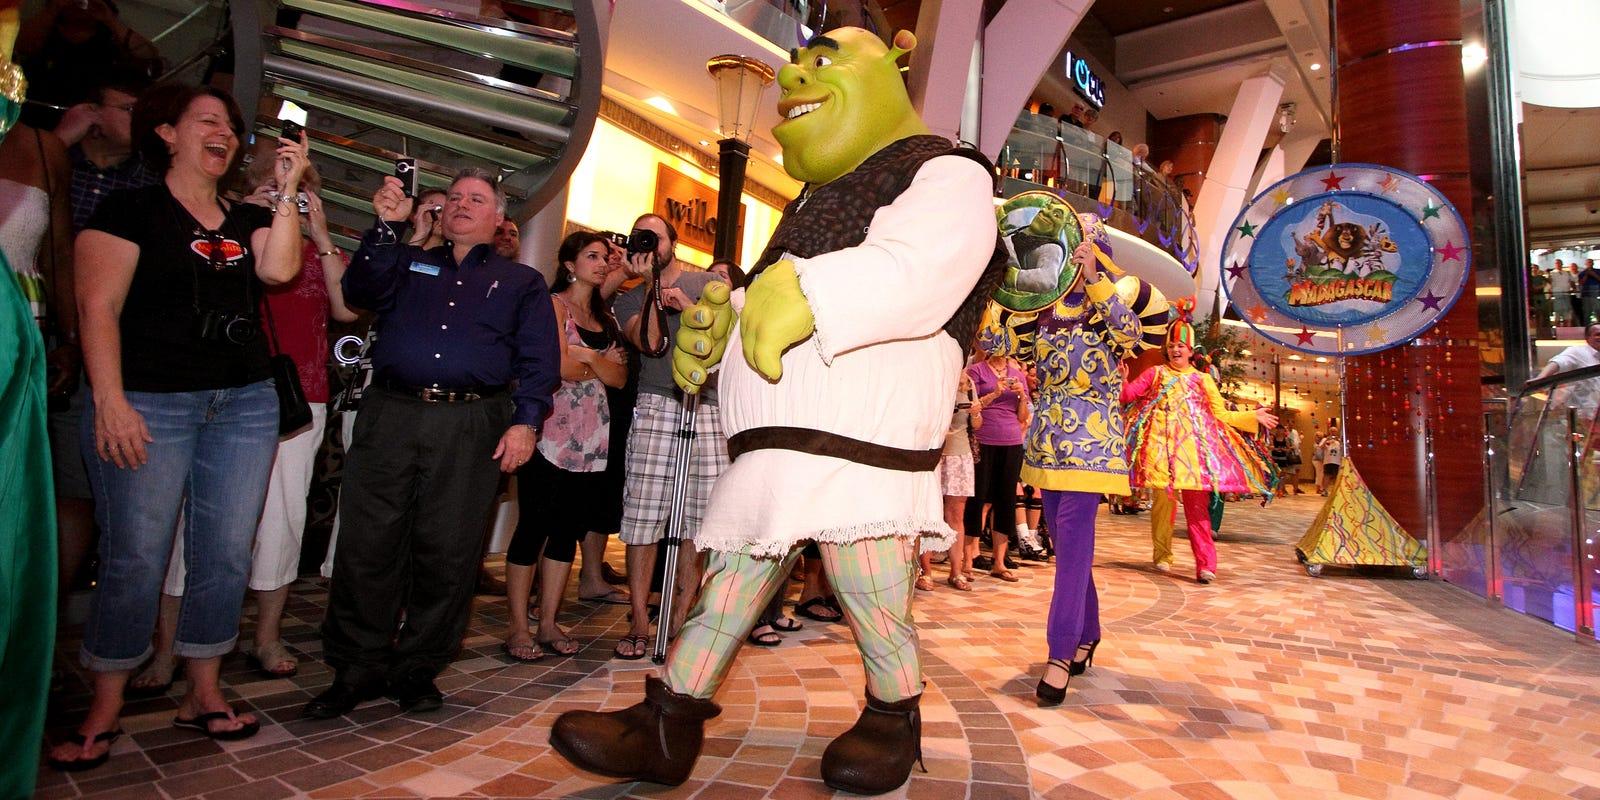 Royal Caribbean expands DreamWorks partnership to sixth ship